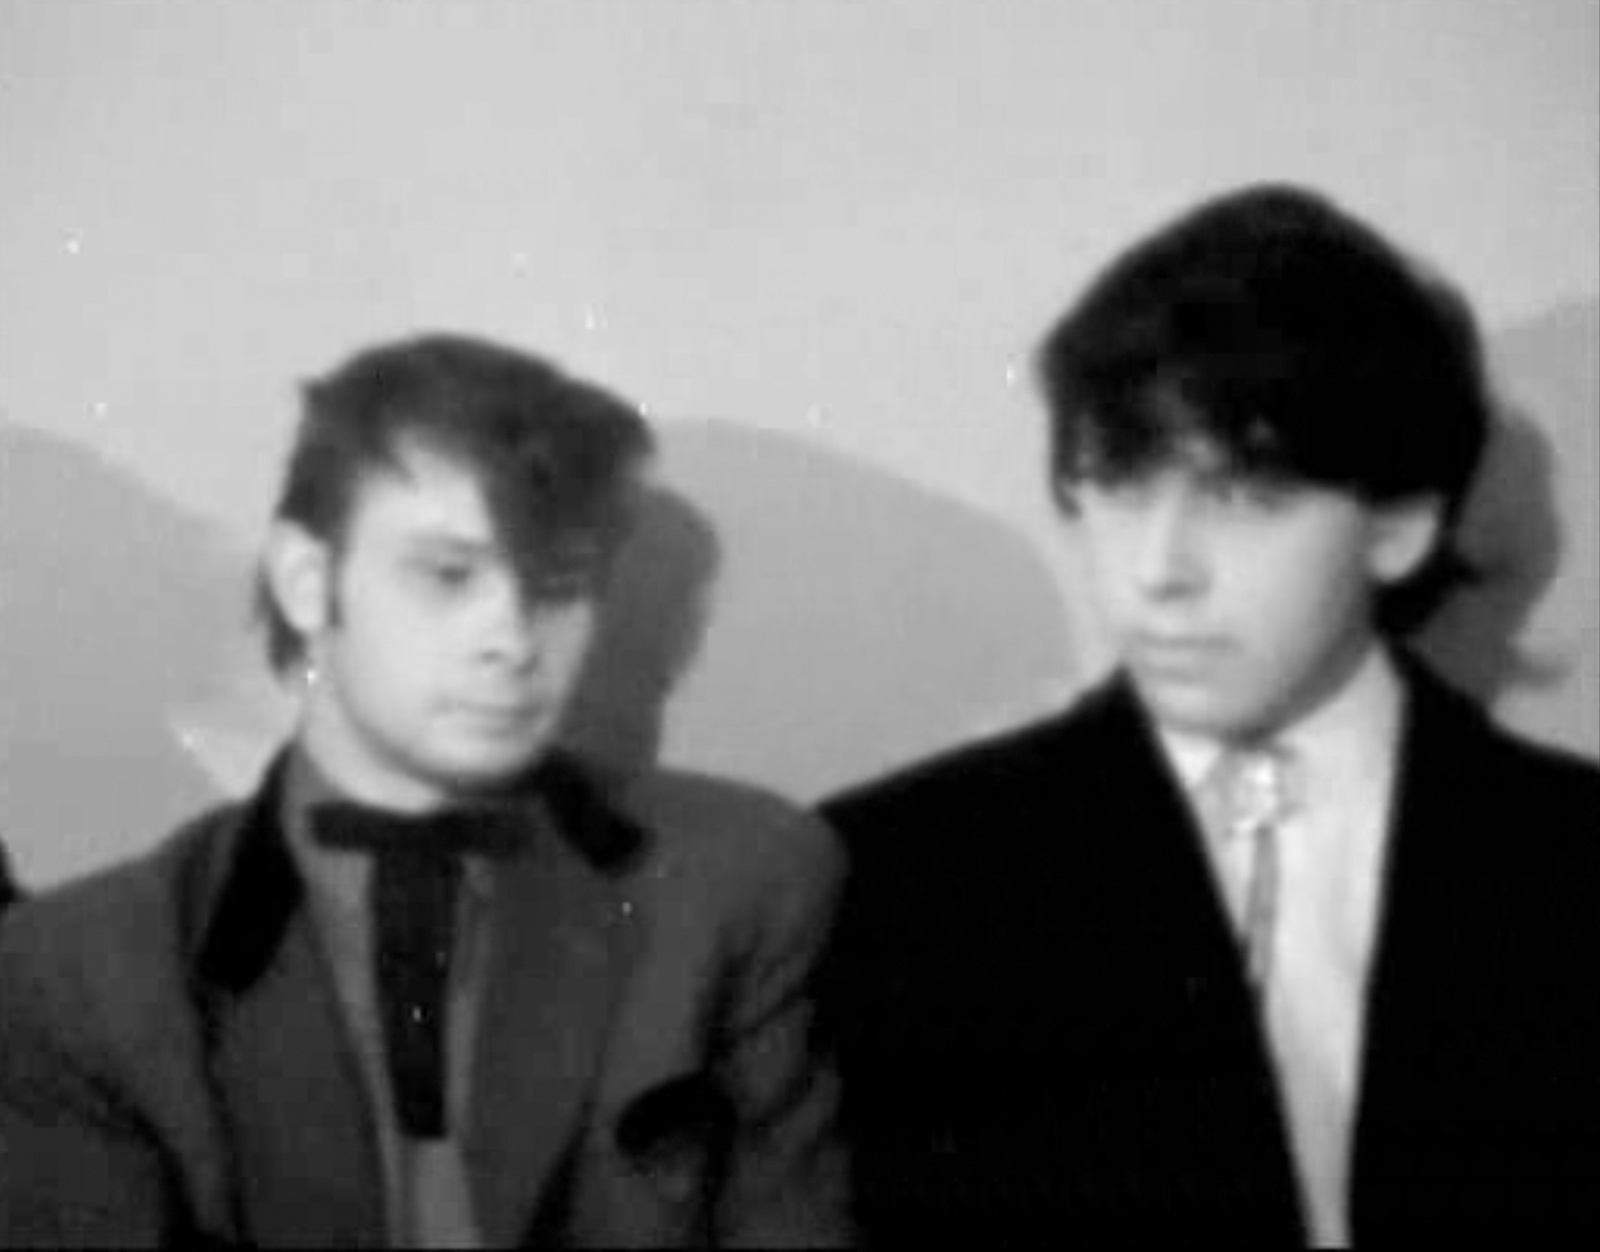 http://1.bp.blogspot.com/-PqP0iOF7hlM/Ta1KwLjBJJI/AAAAAAAAJOU/LZlt8AizqDA/s1600/Mods-Rockers-1964-photography-www.lylybye.blogspot.com_13.png